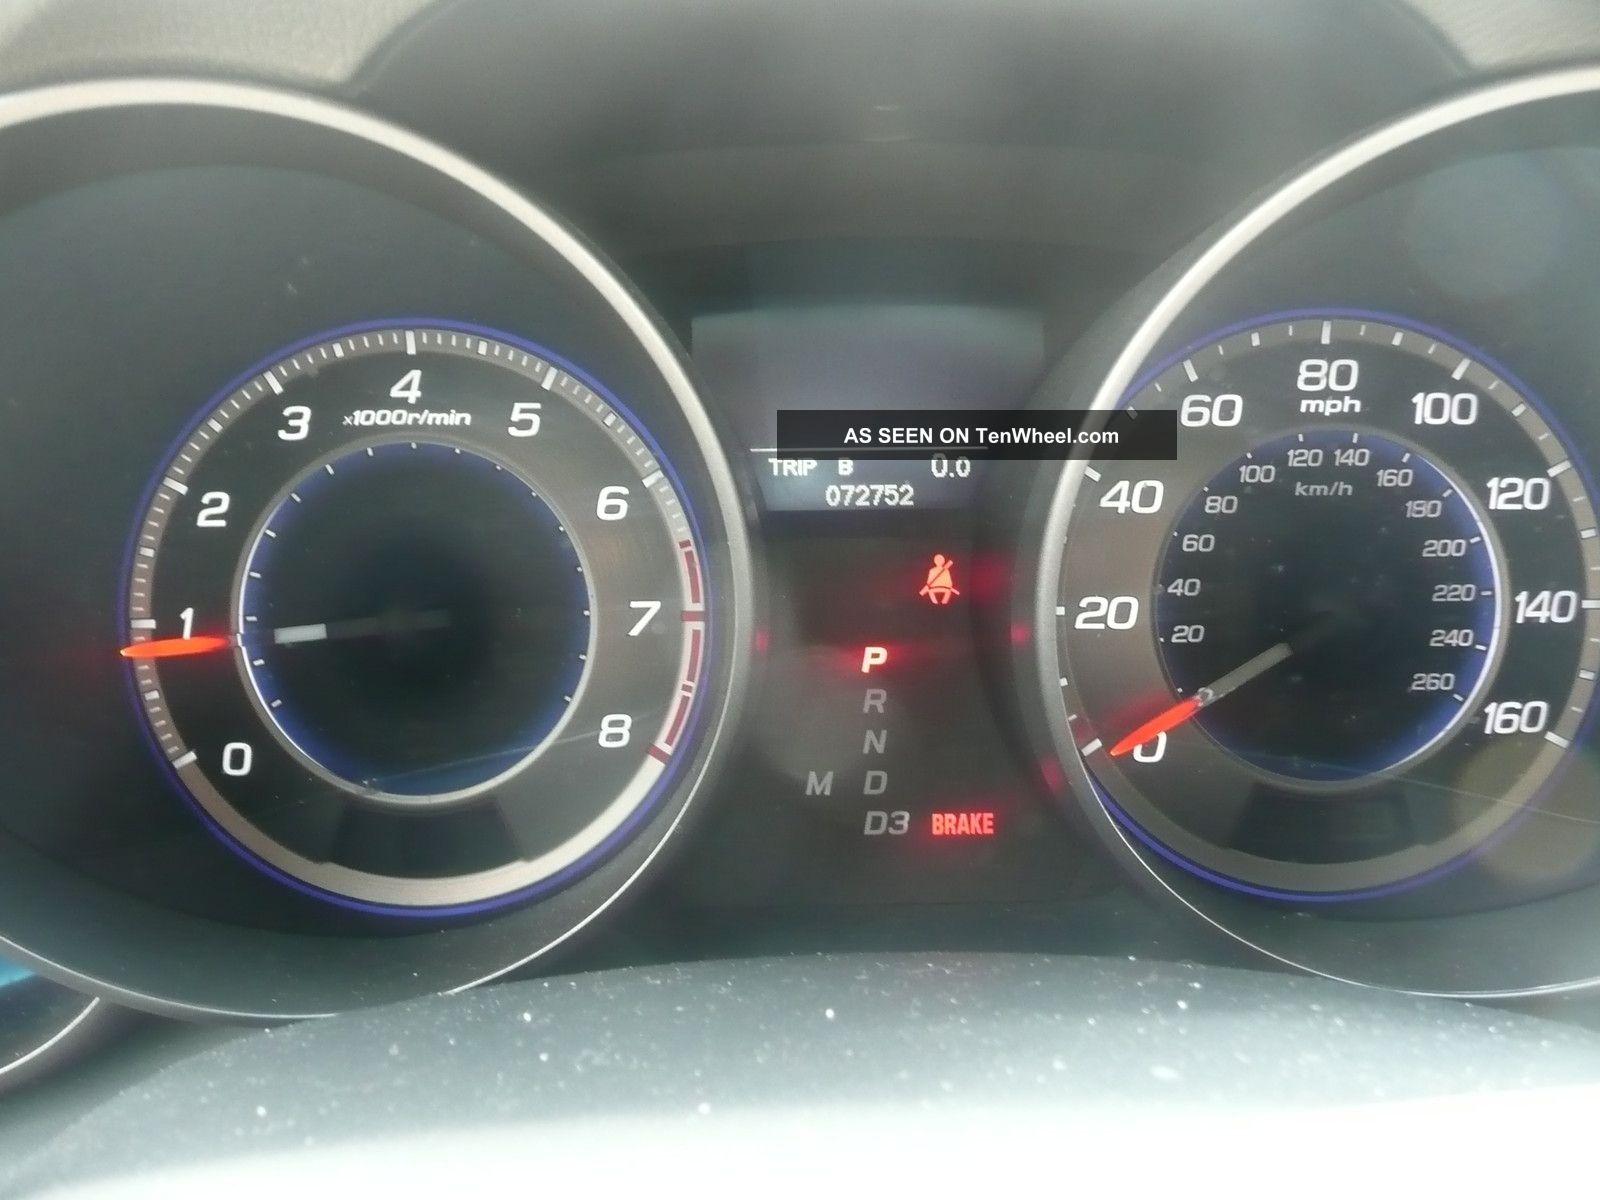 2007 Acura Mdx Awd Sport Edition Suv